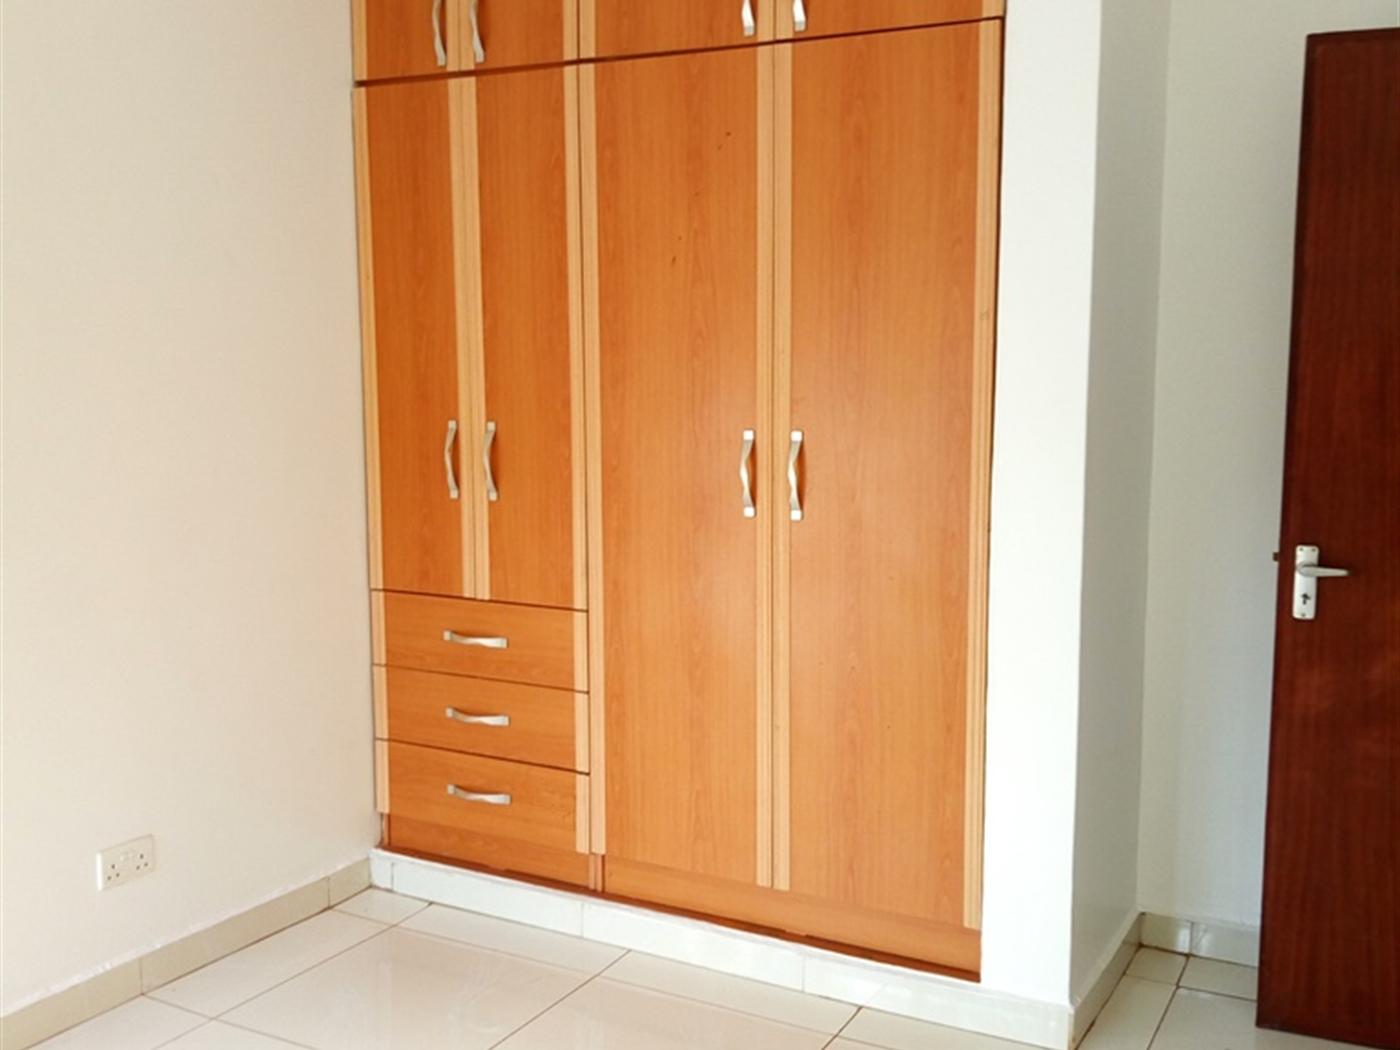 Rental units for sale in Kyanjja Kampala